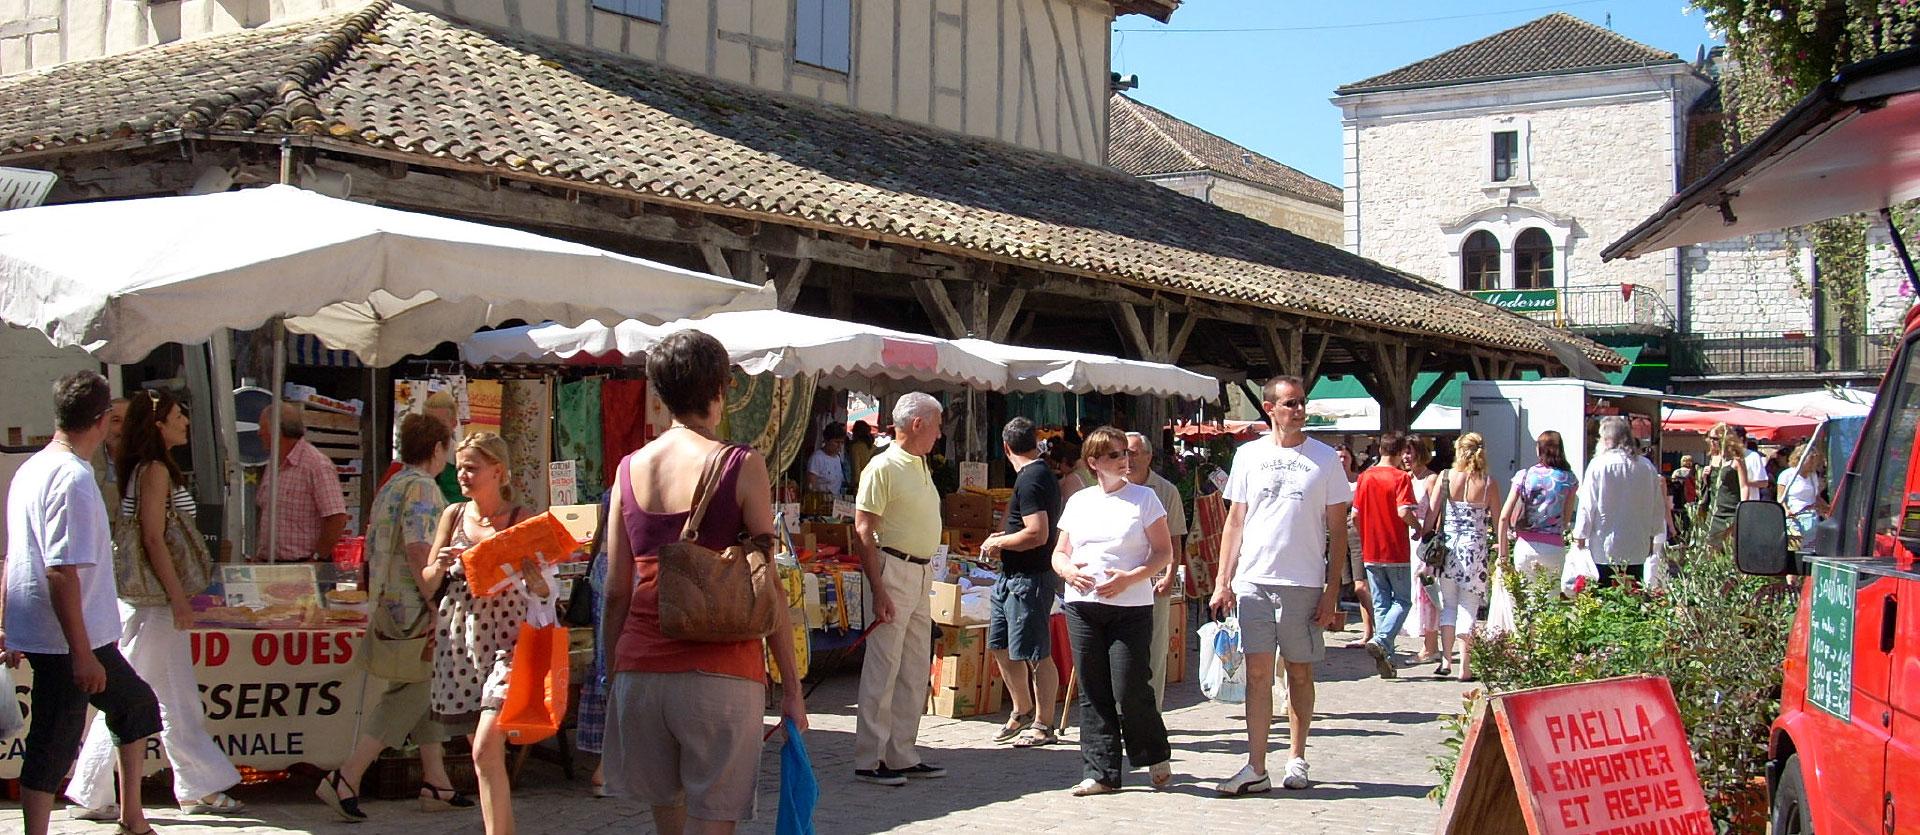 Villereal market